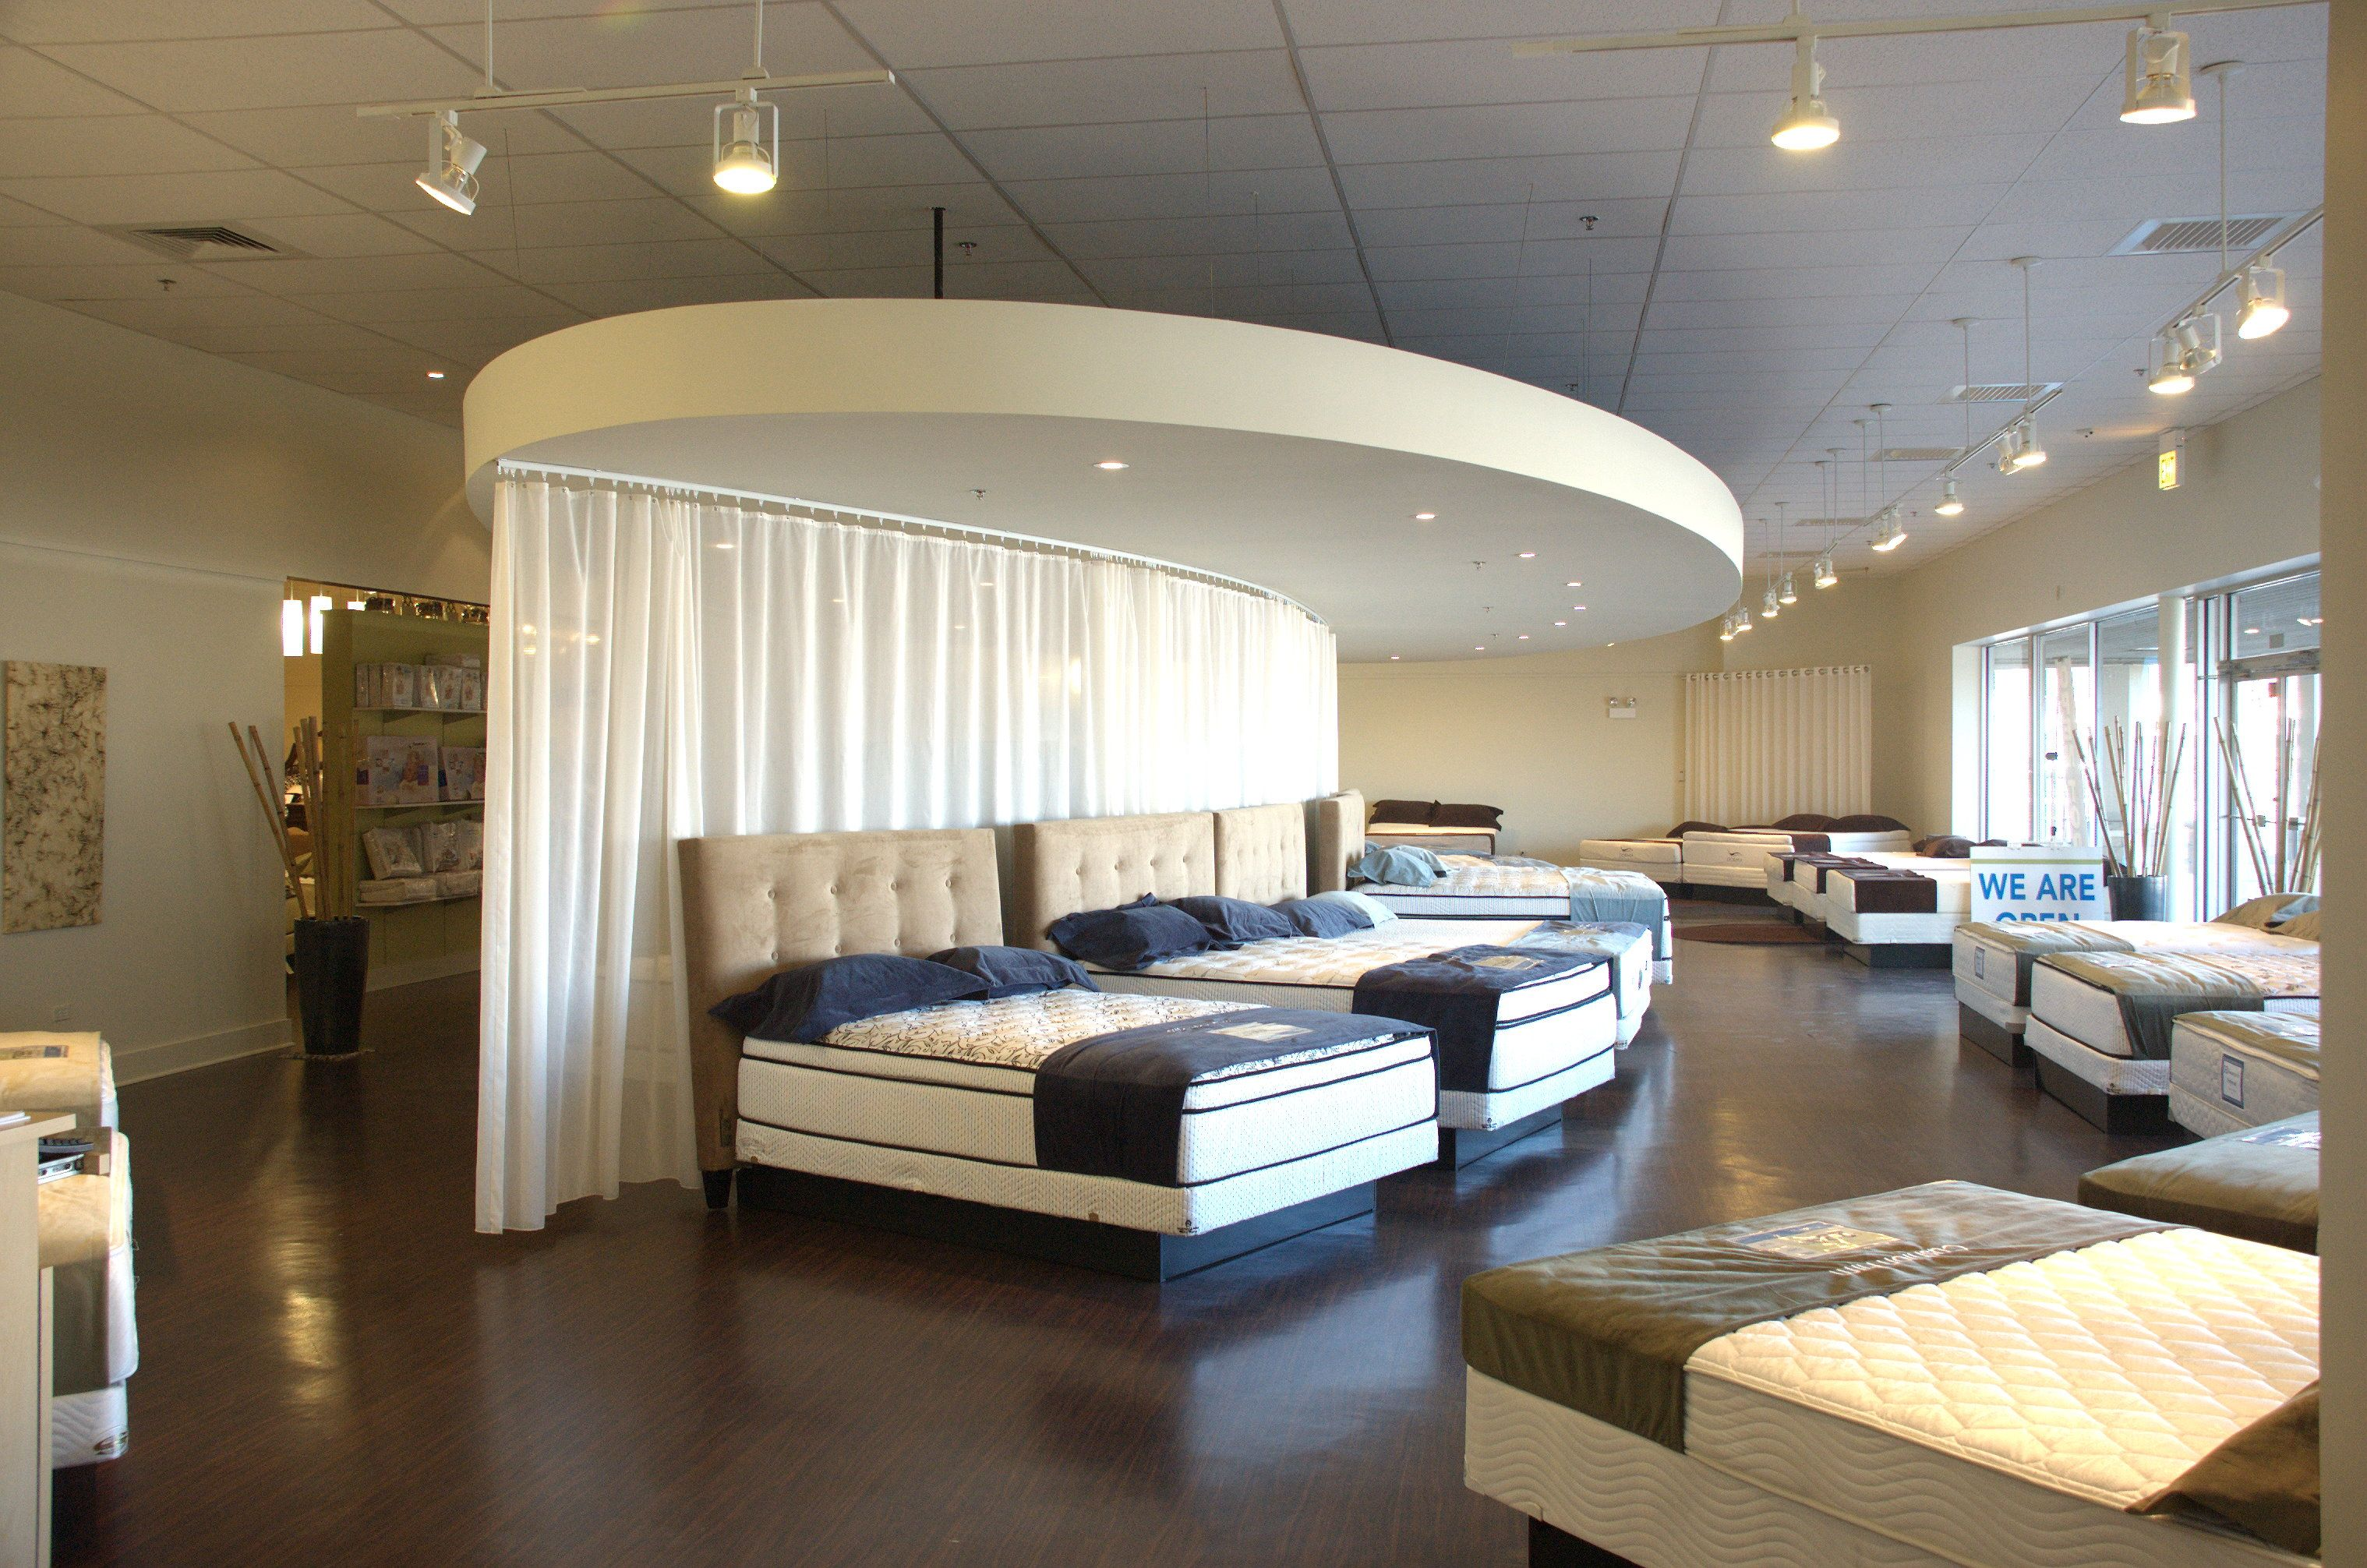 rc serta jordan jsp mattress queen furniture firm applause willey view mattresses ii store rcwilley hybrid icomfort s